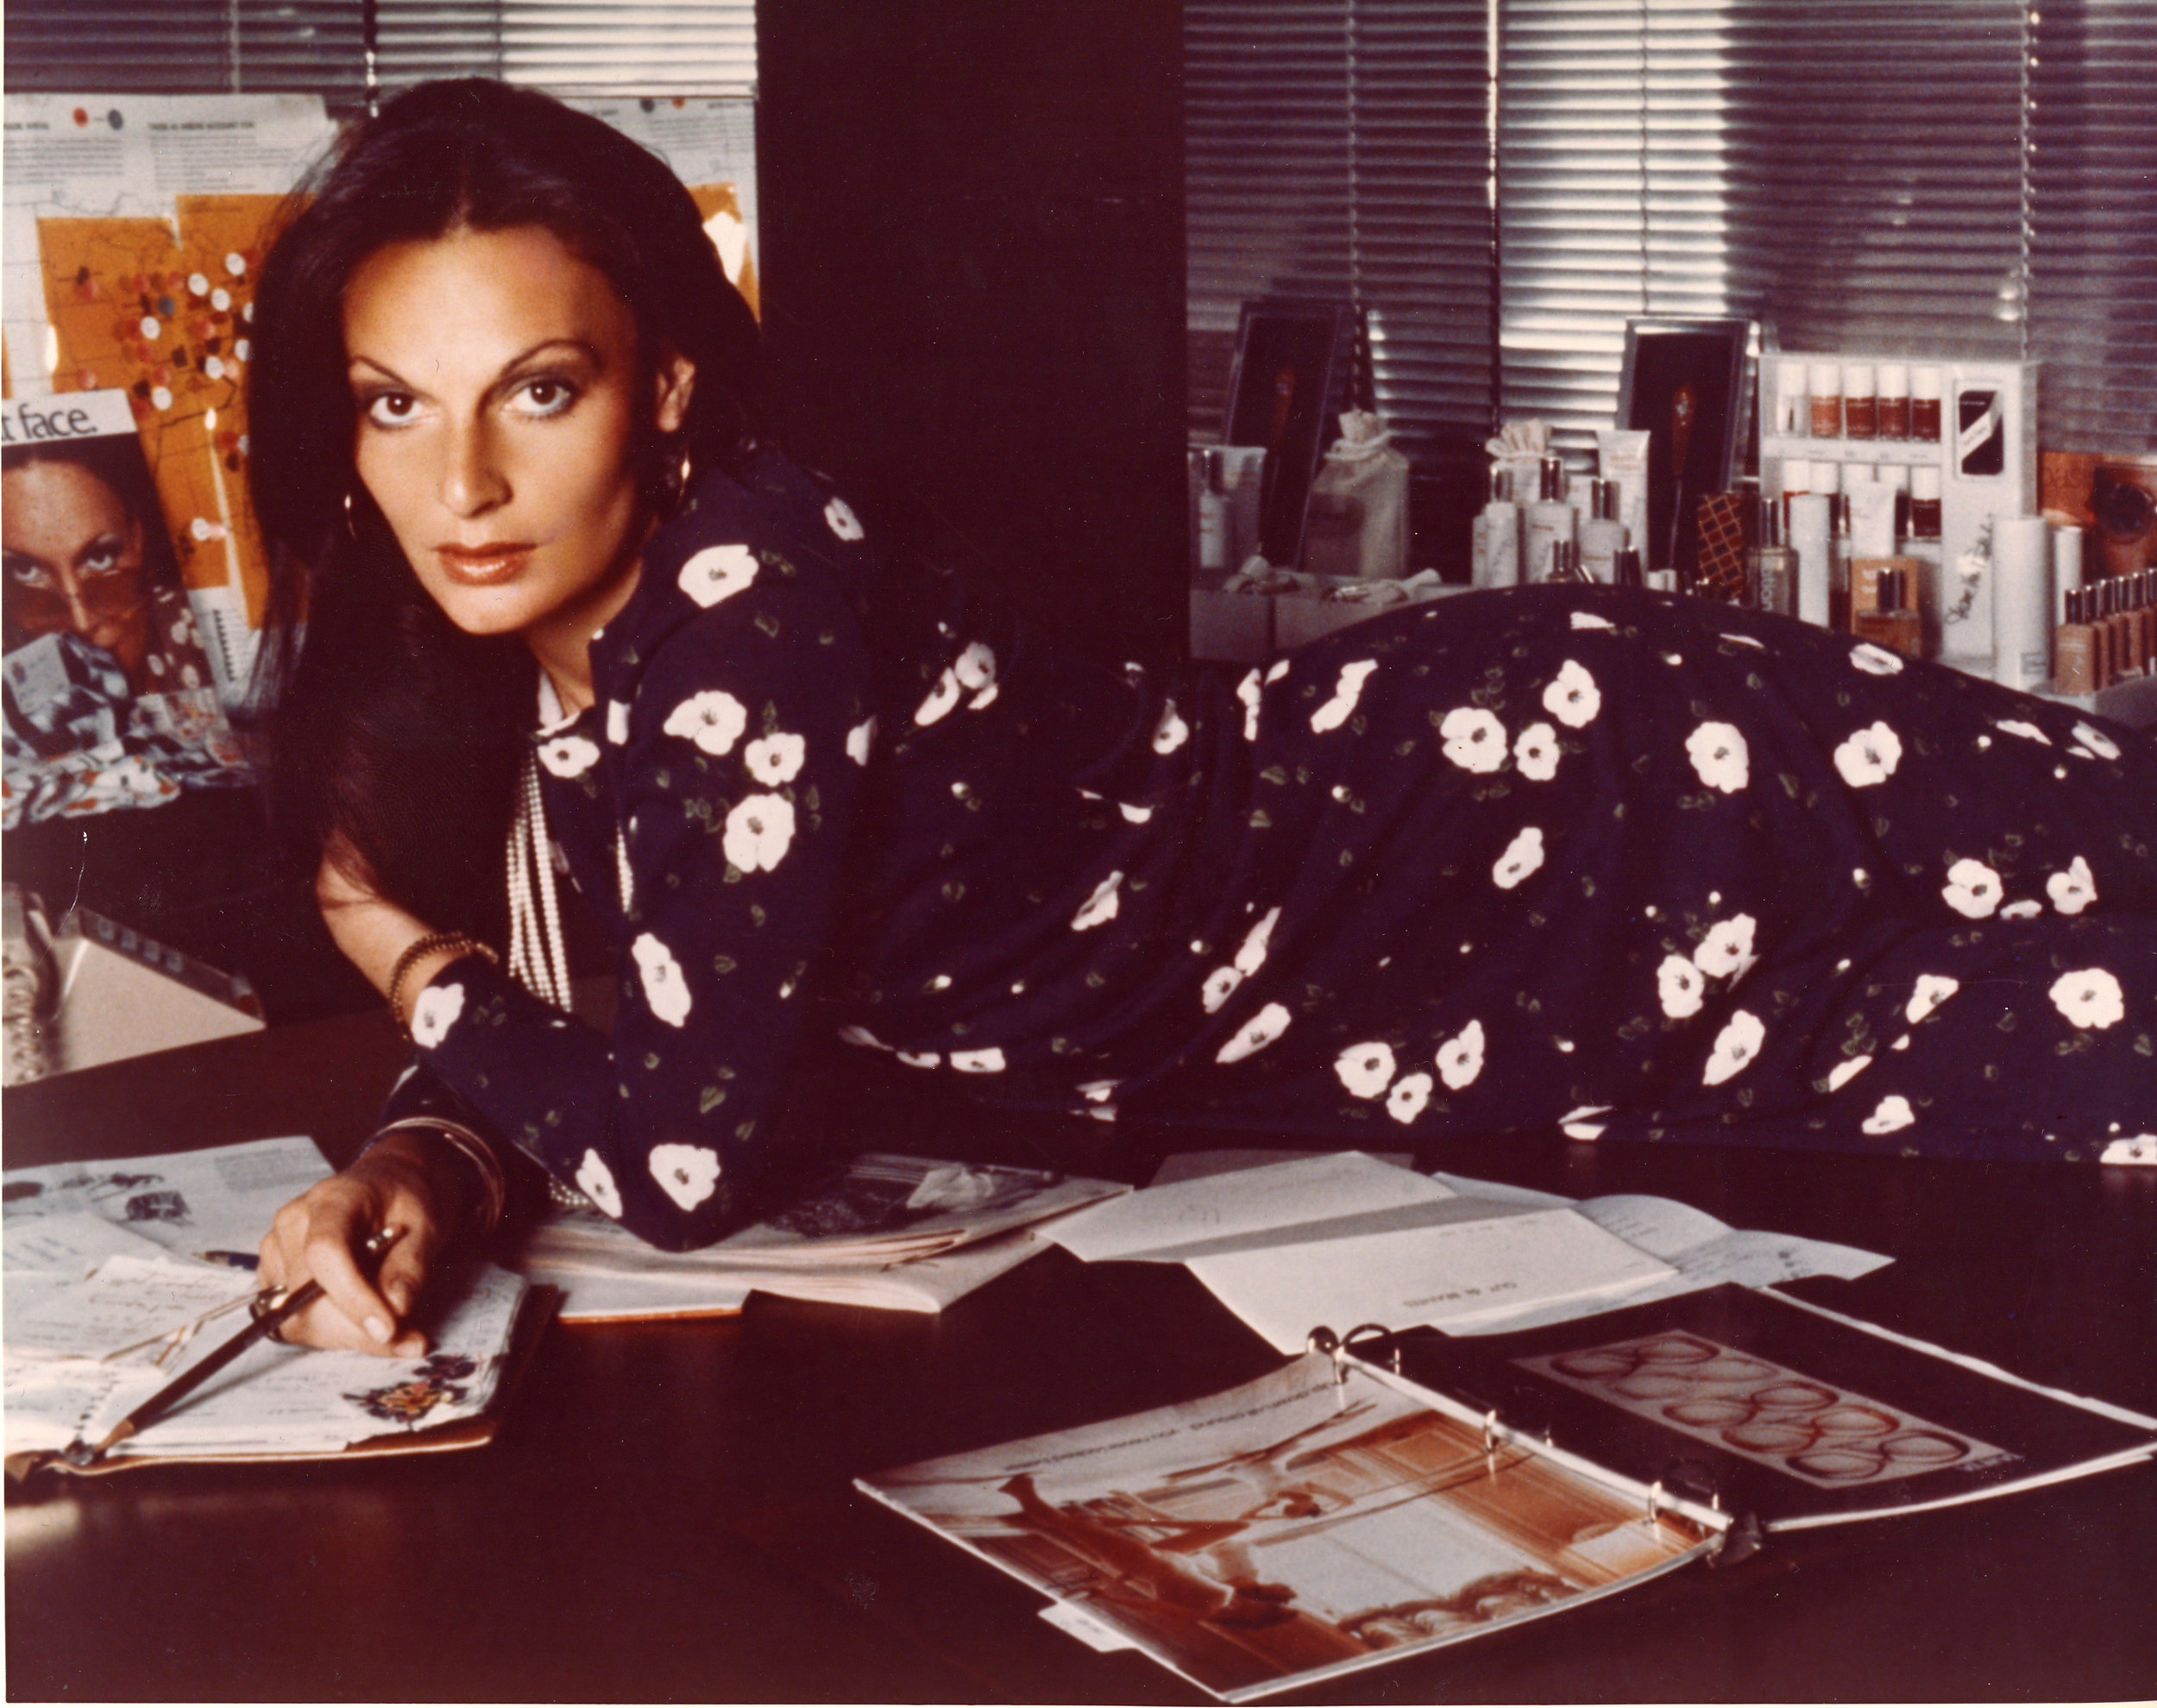 Diane in the Seventies. Photo: Ara Gallant (1976)